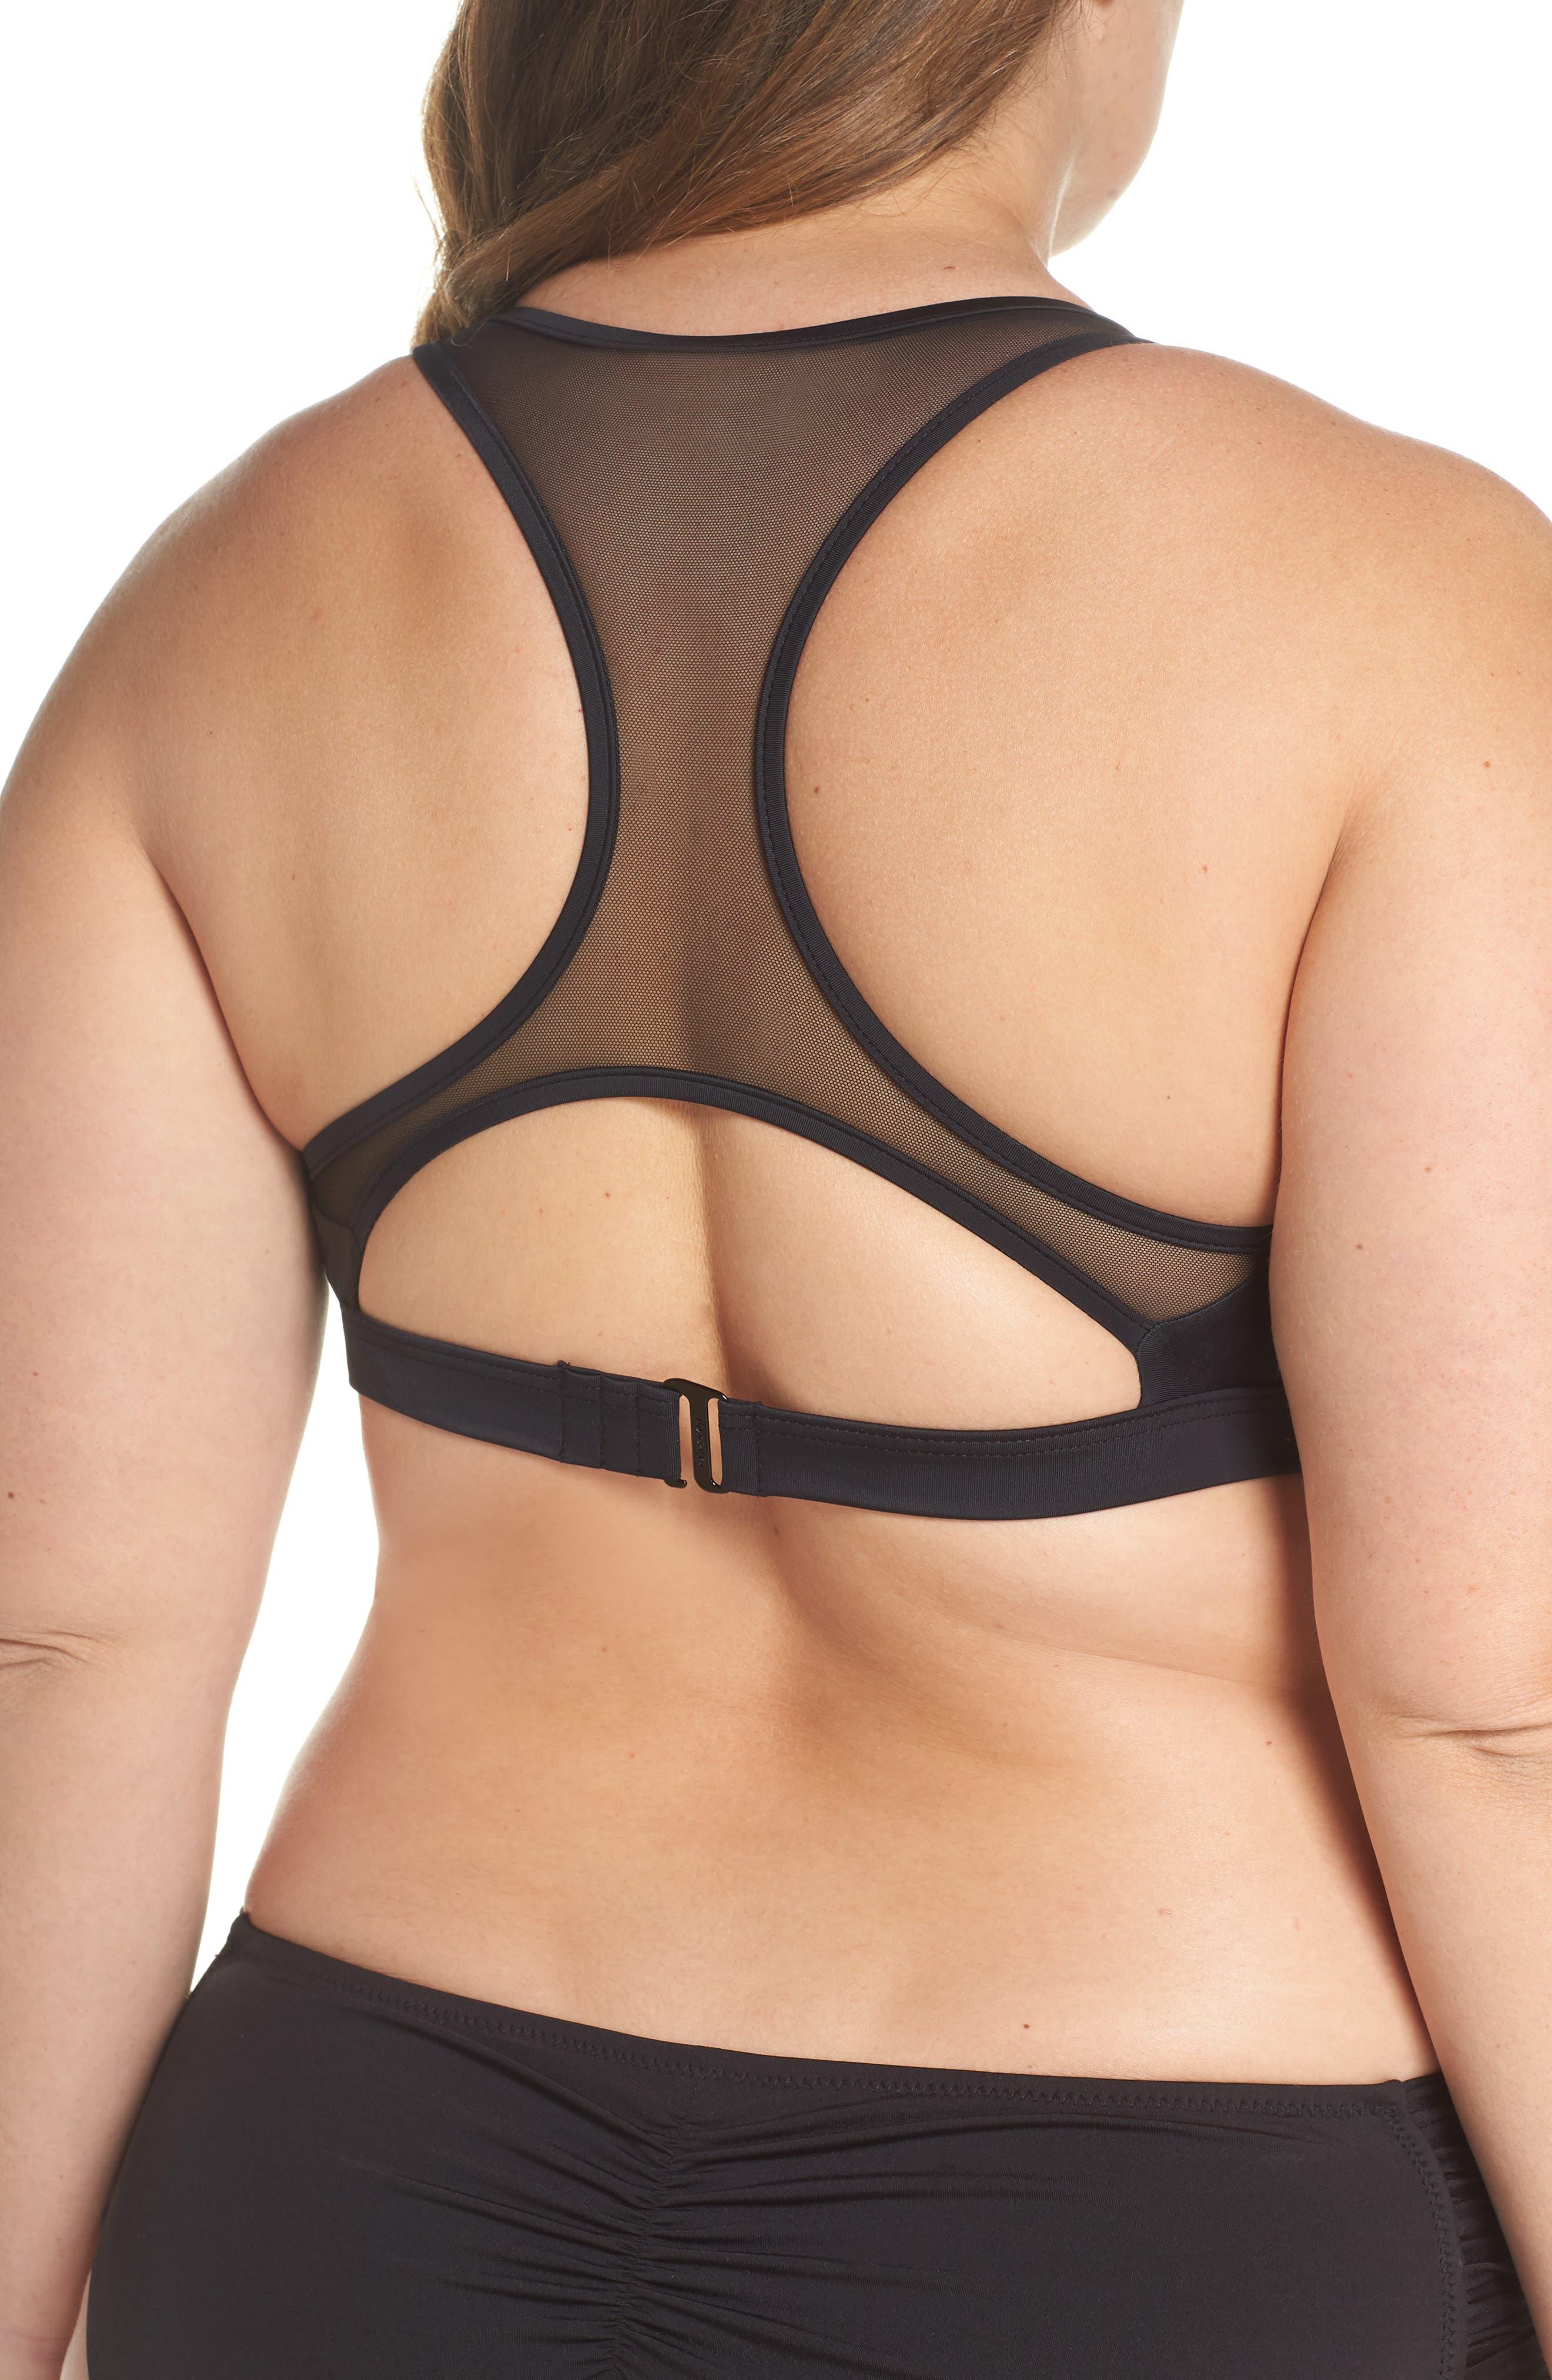 Saldana Cutout Bikini Top,                             Alternate thumbnail 2, color,                             Black